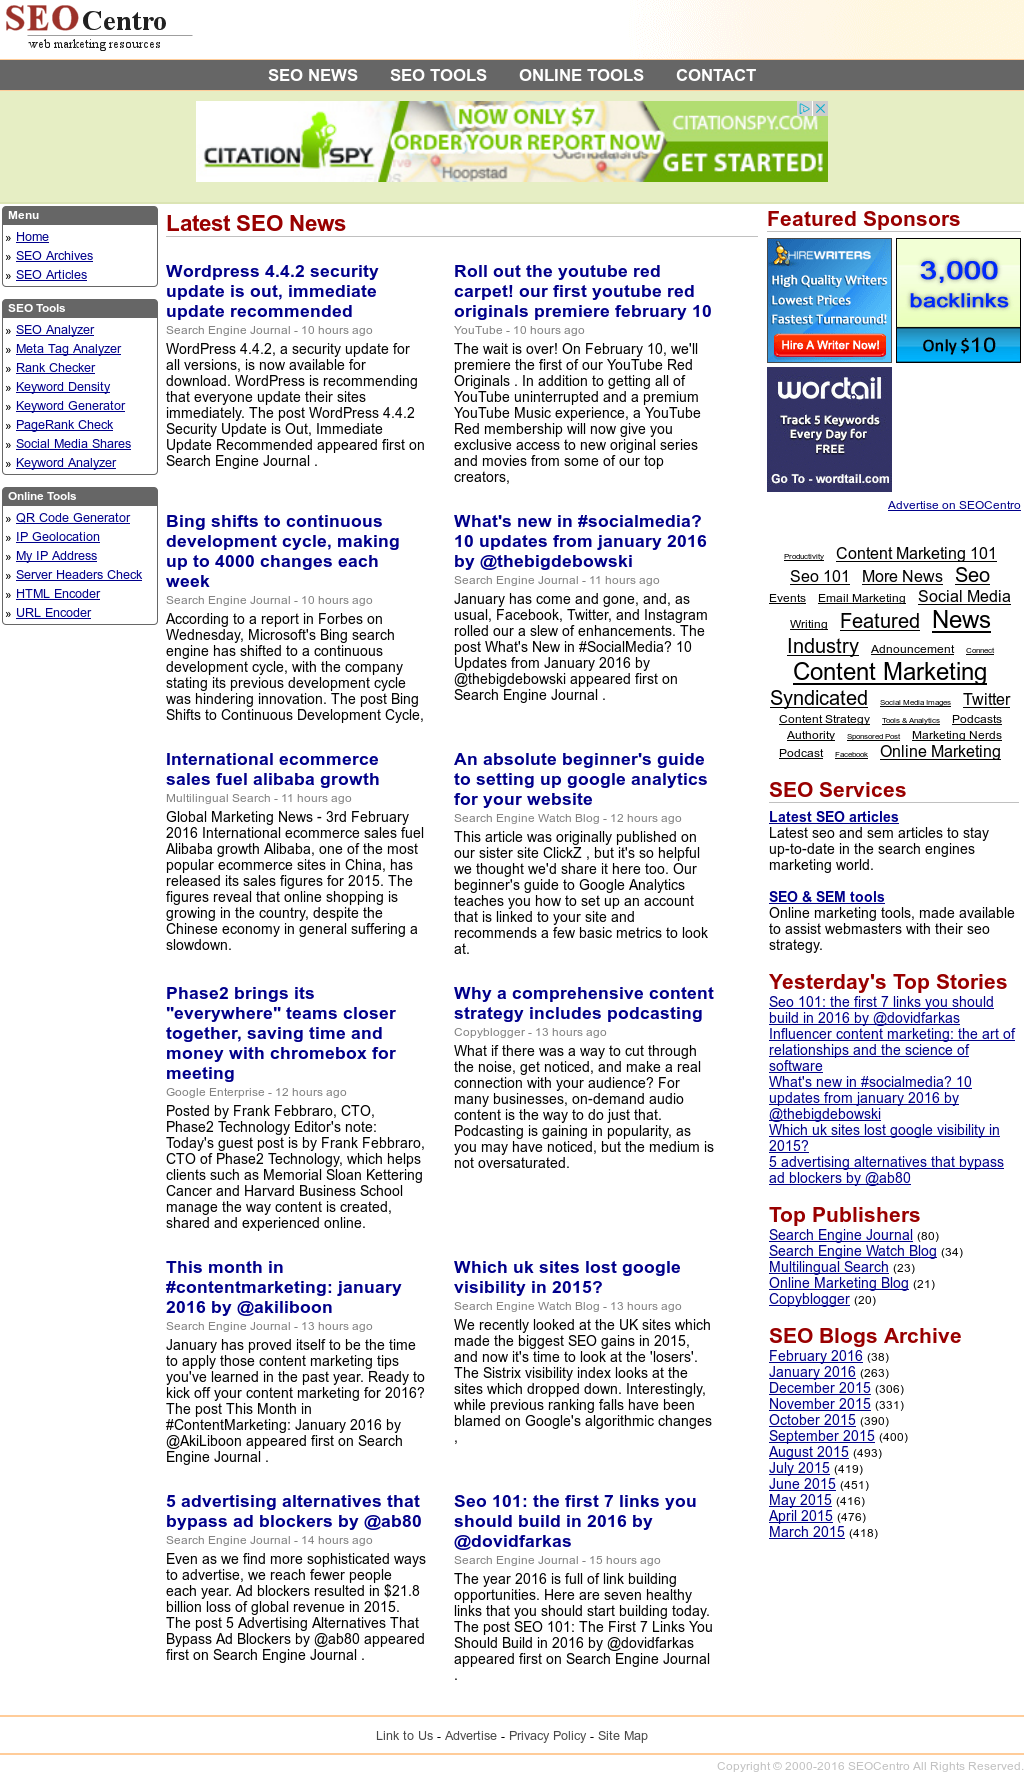 SEOCentro Competitors, Revenue and Employees - Owler Company Profile